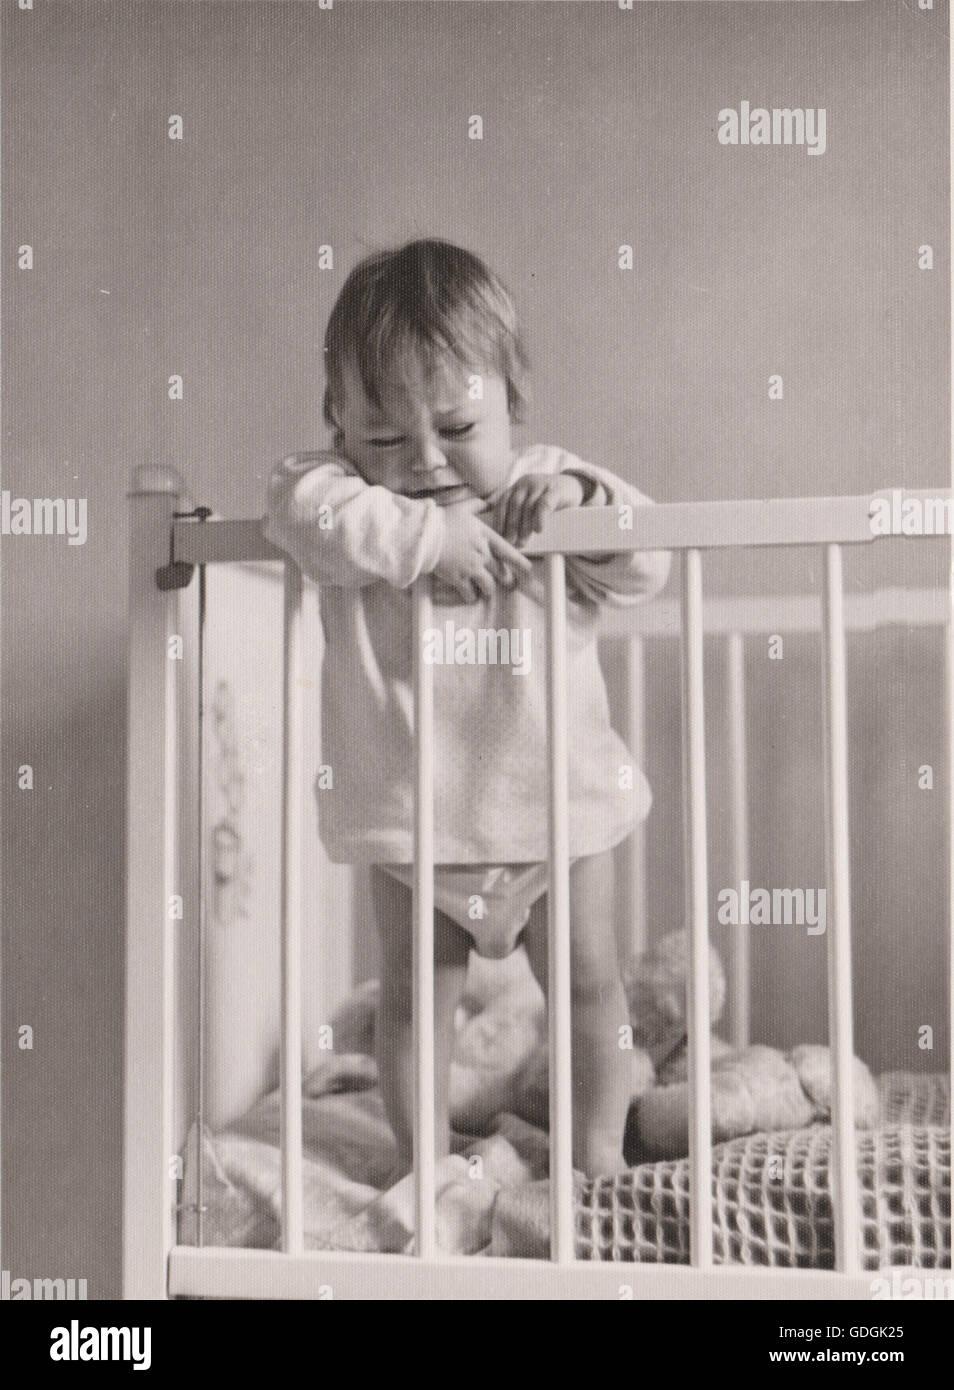 1950s Baby Black And White Stock Photos Amp 1950s Baby Black